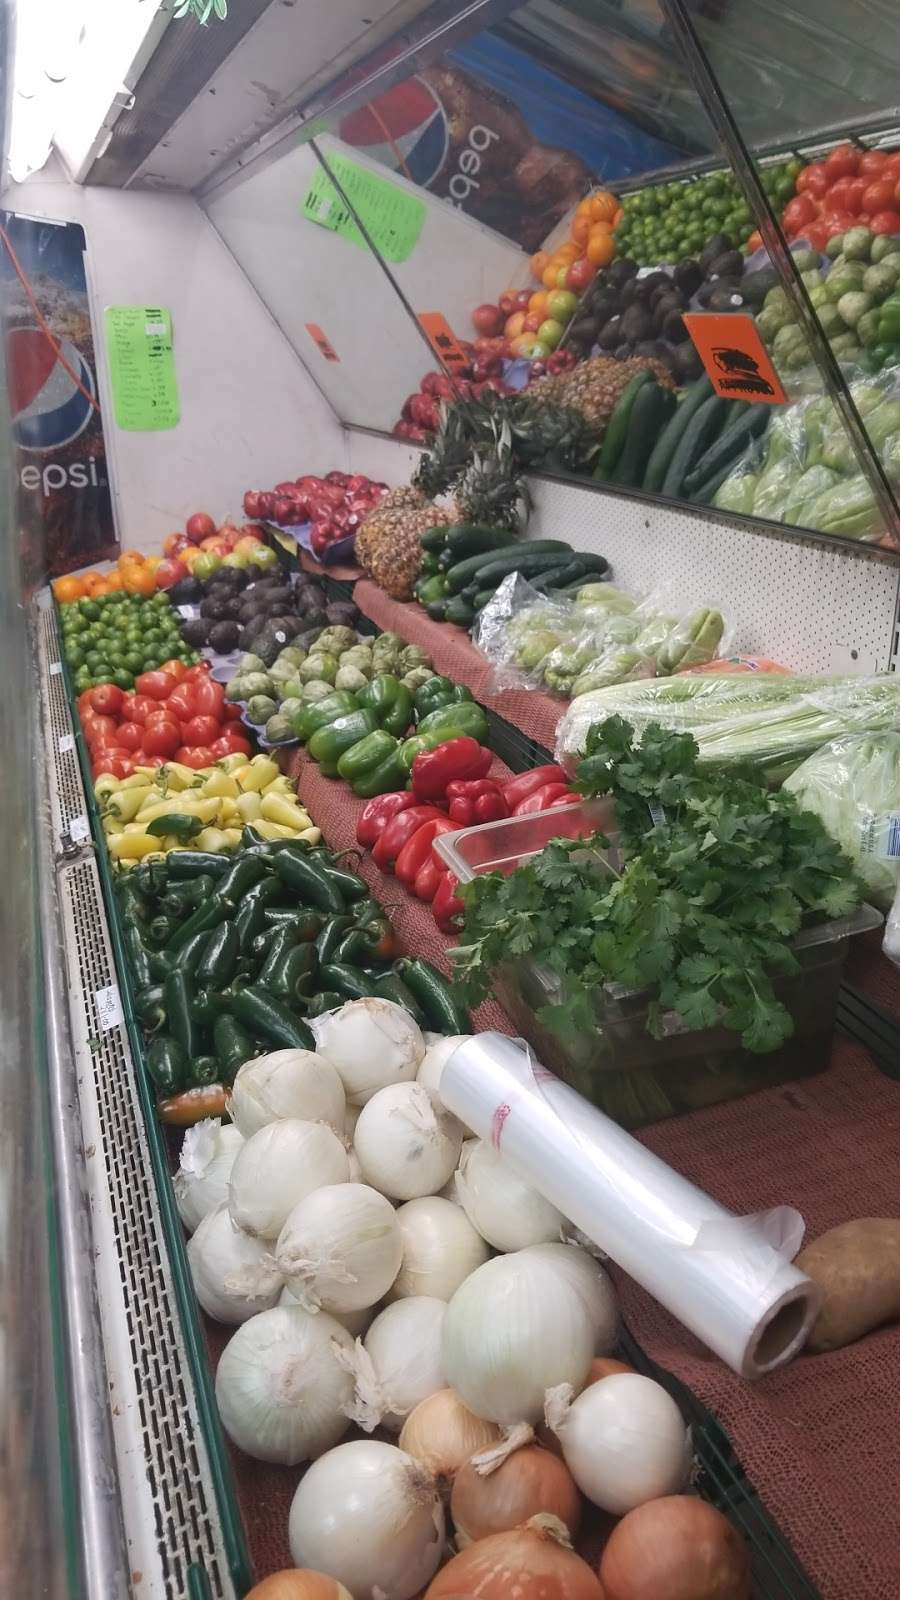 Latino Market - convenience store  | Photo 5 of 10 | Address: 7806 N 27th Ave, Phoenix, AZ 85051, USA | Phone: (602) 973-5326